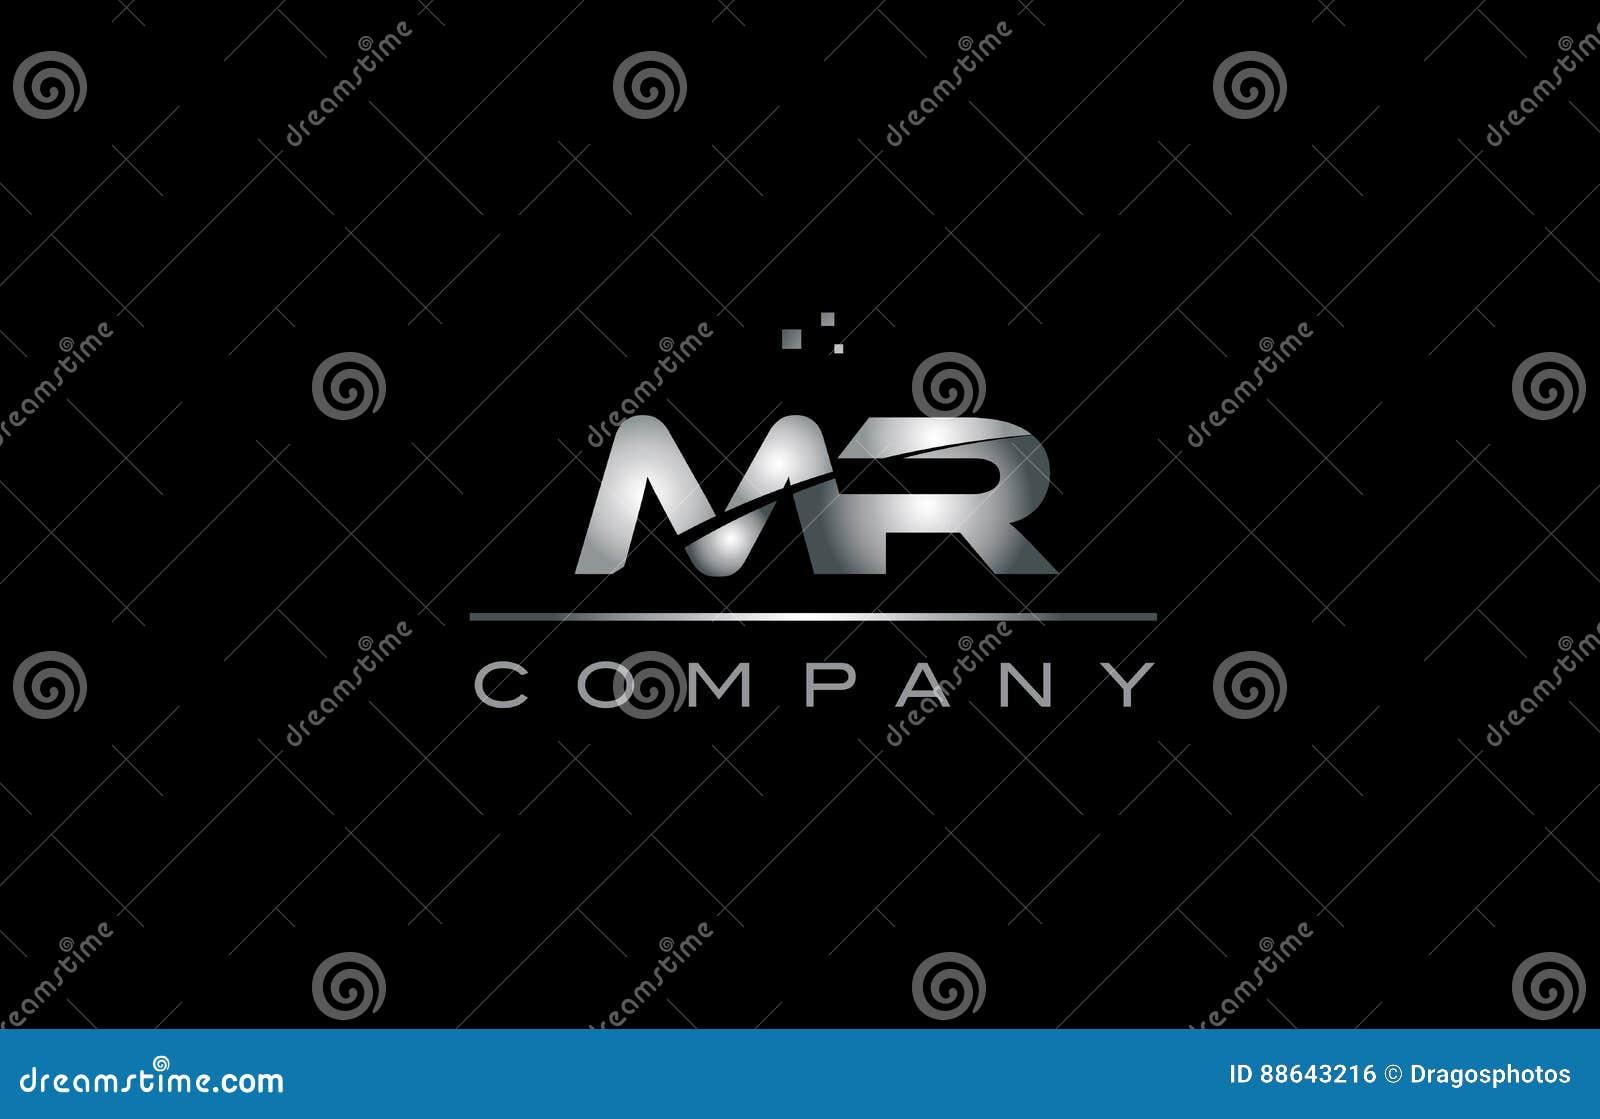 mr cartoons  illustrations  u0026 vector stock images